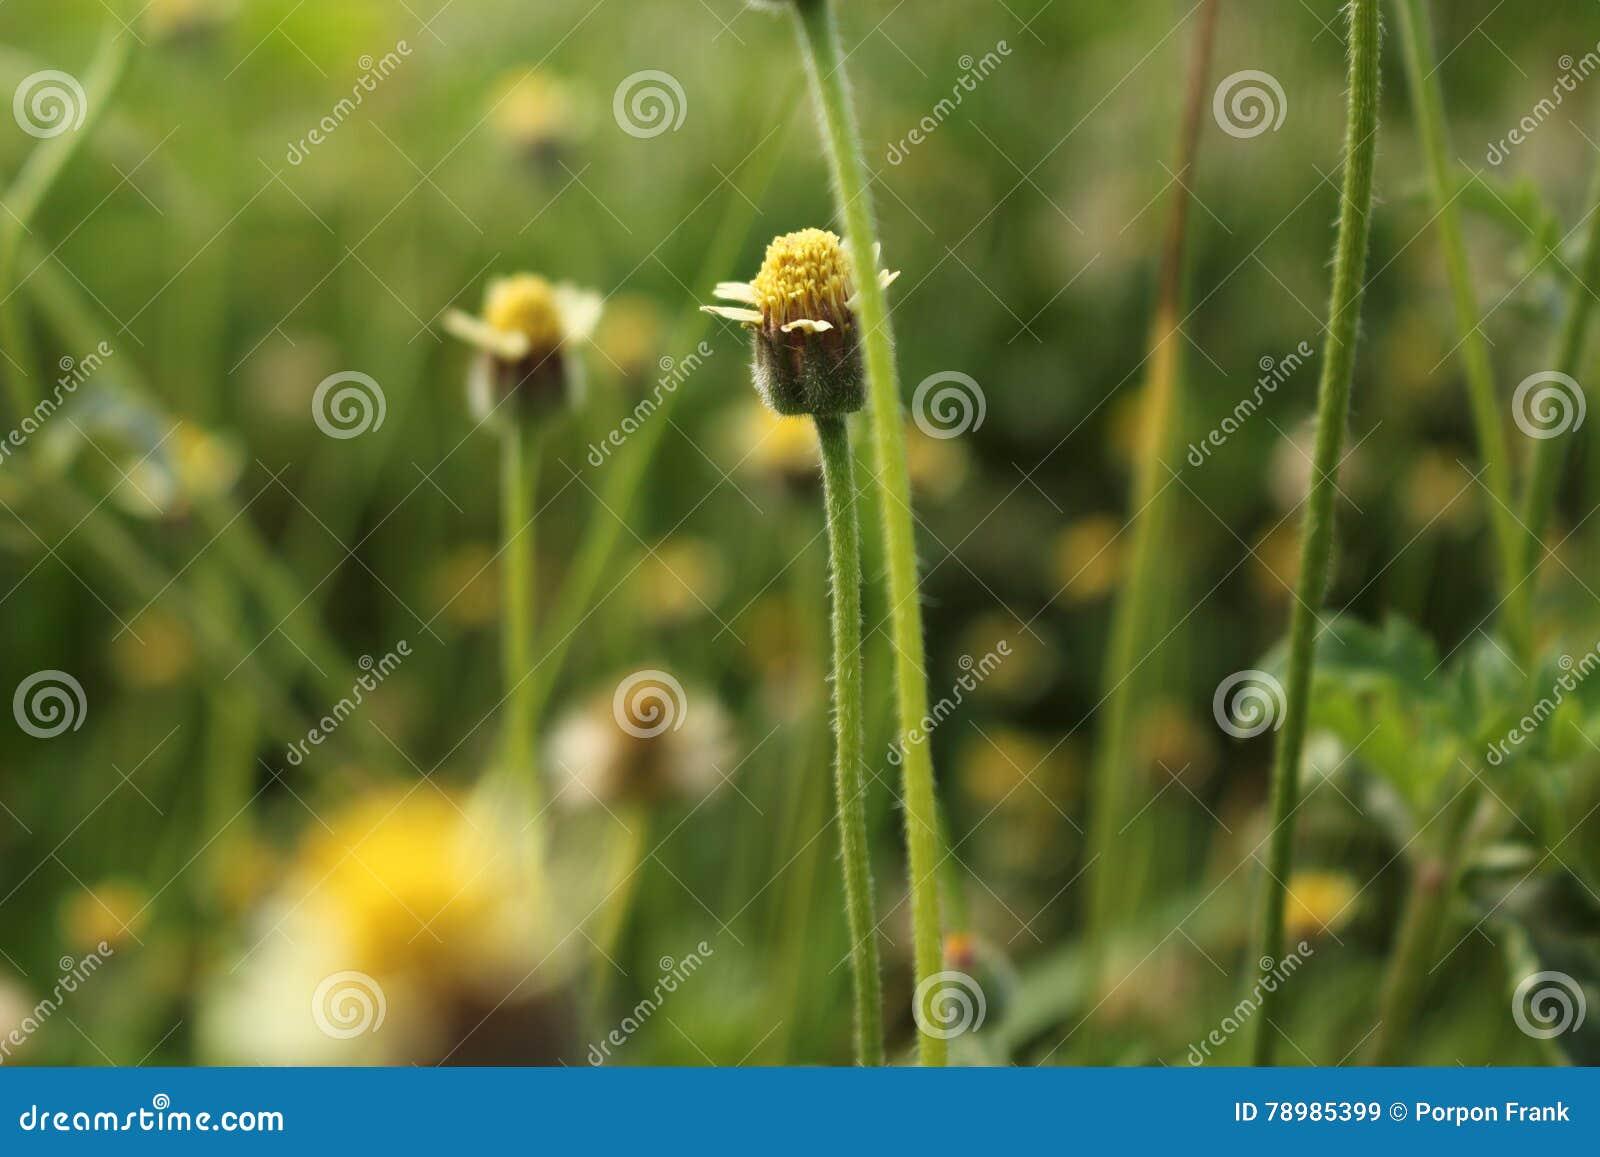 Kwiatu Tridax procumbens